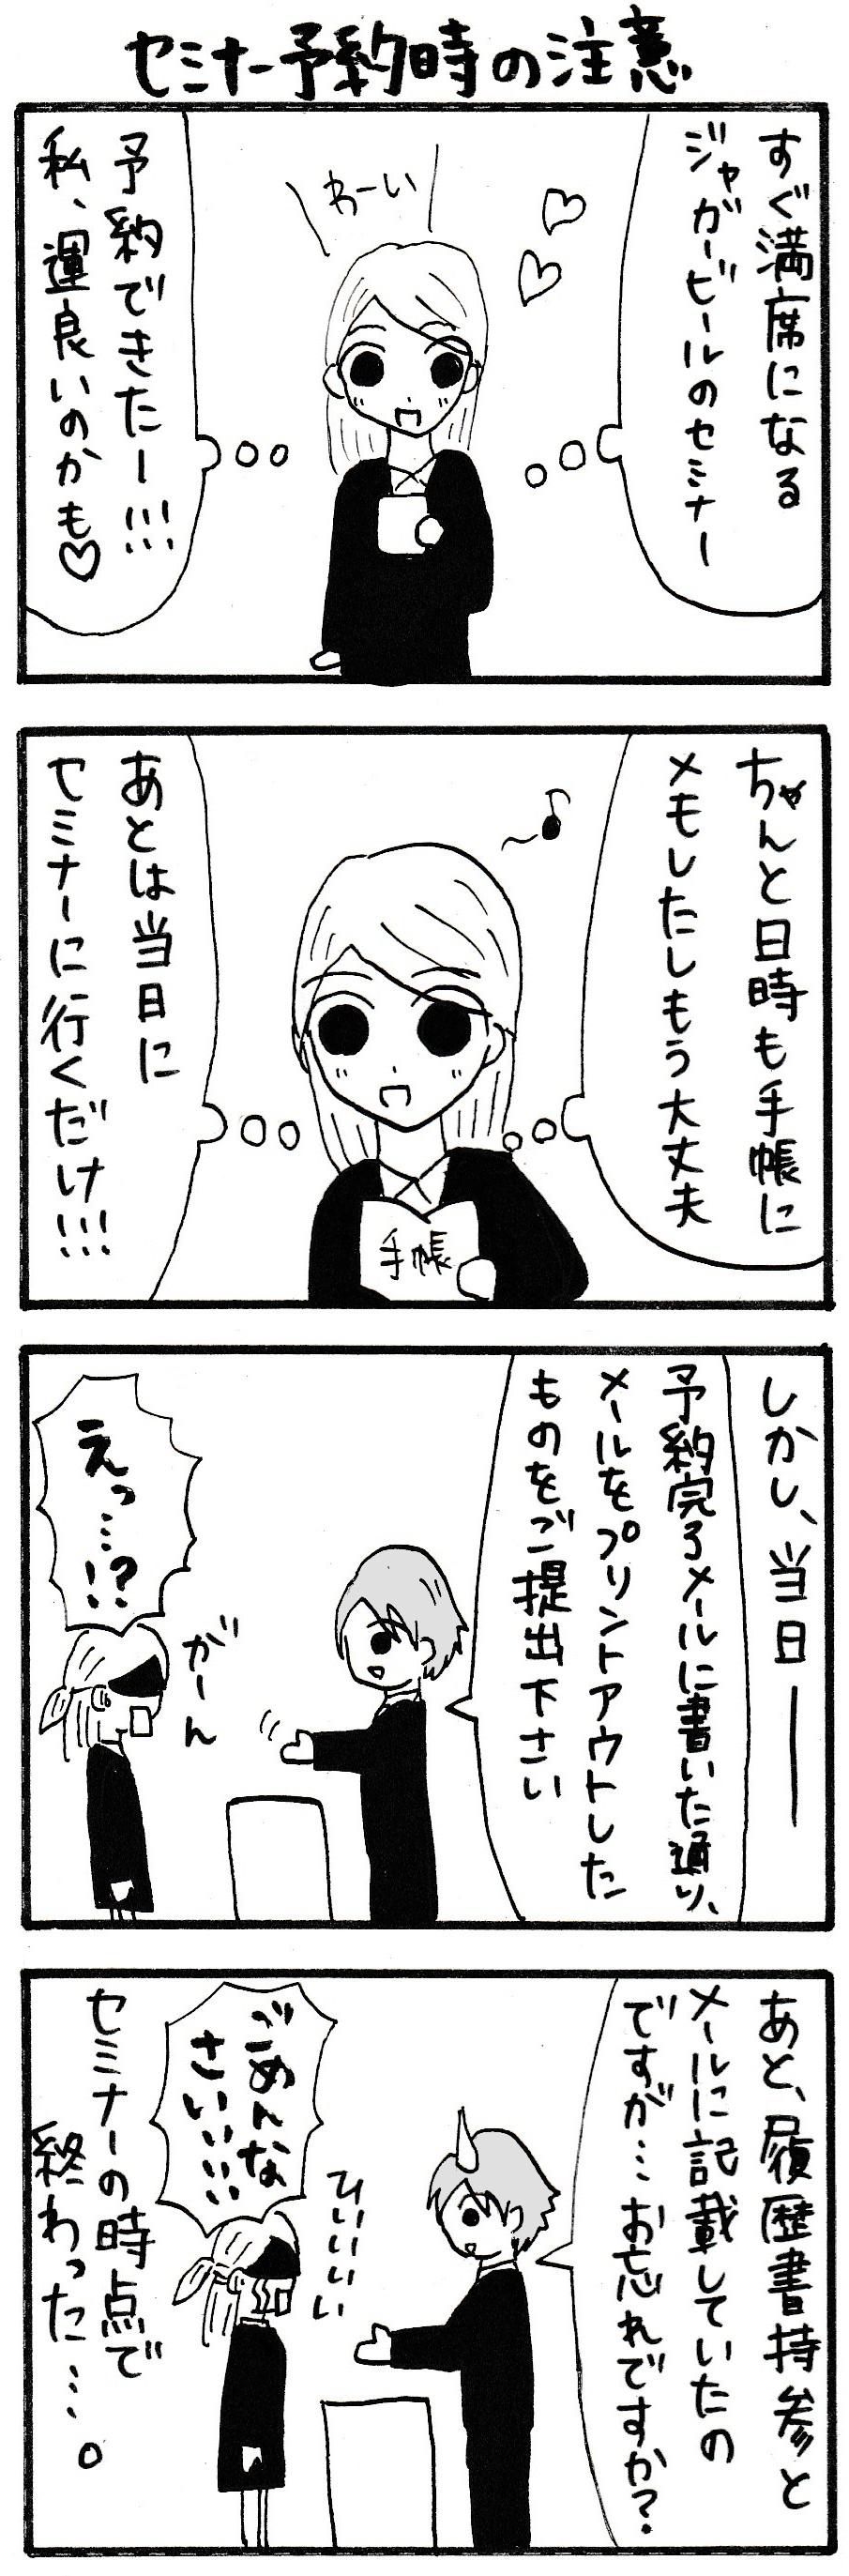 seminaryoyakujino